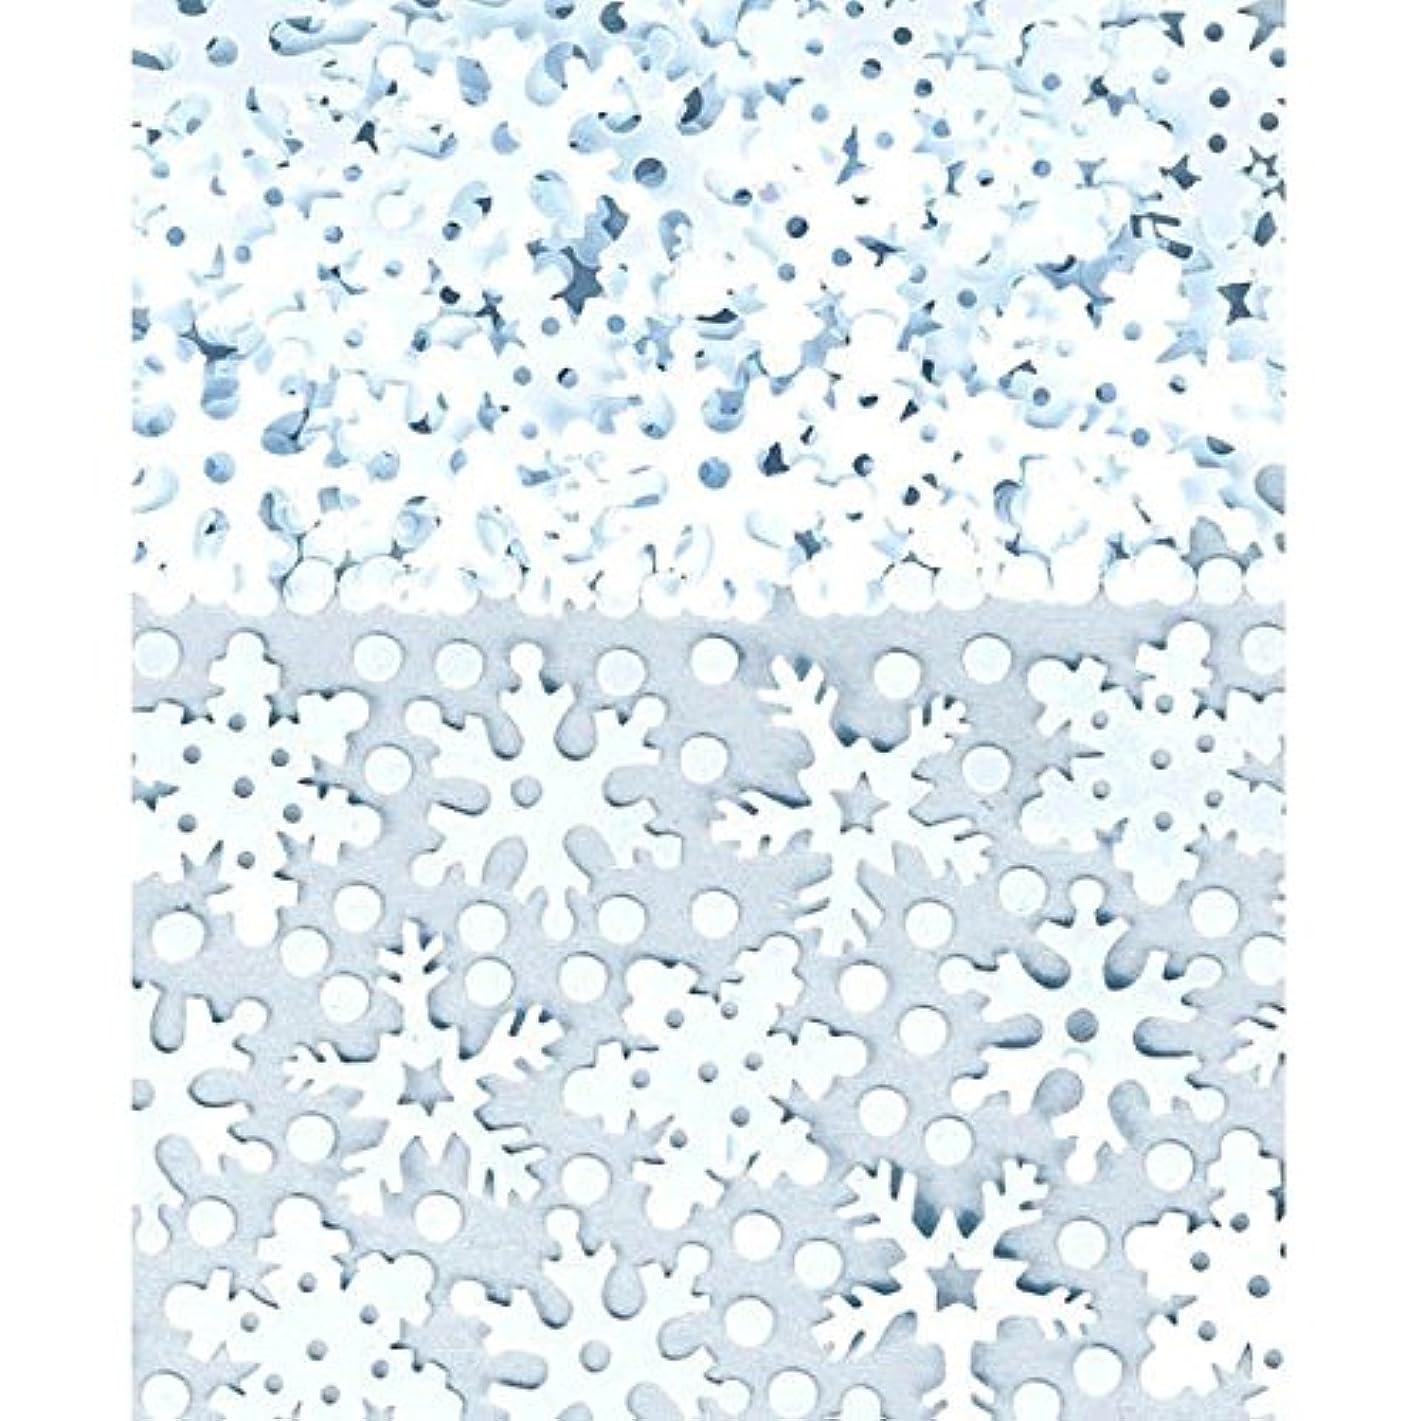 Sparkly Snow Foil Christmas Mix Confetti | Party Decoration